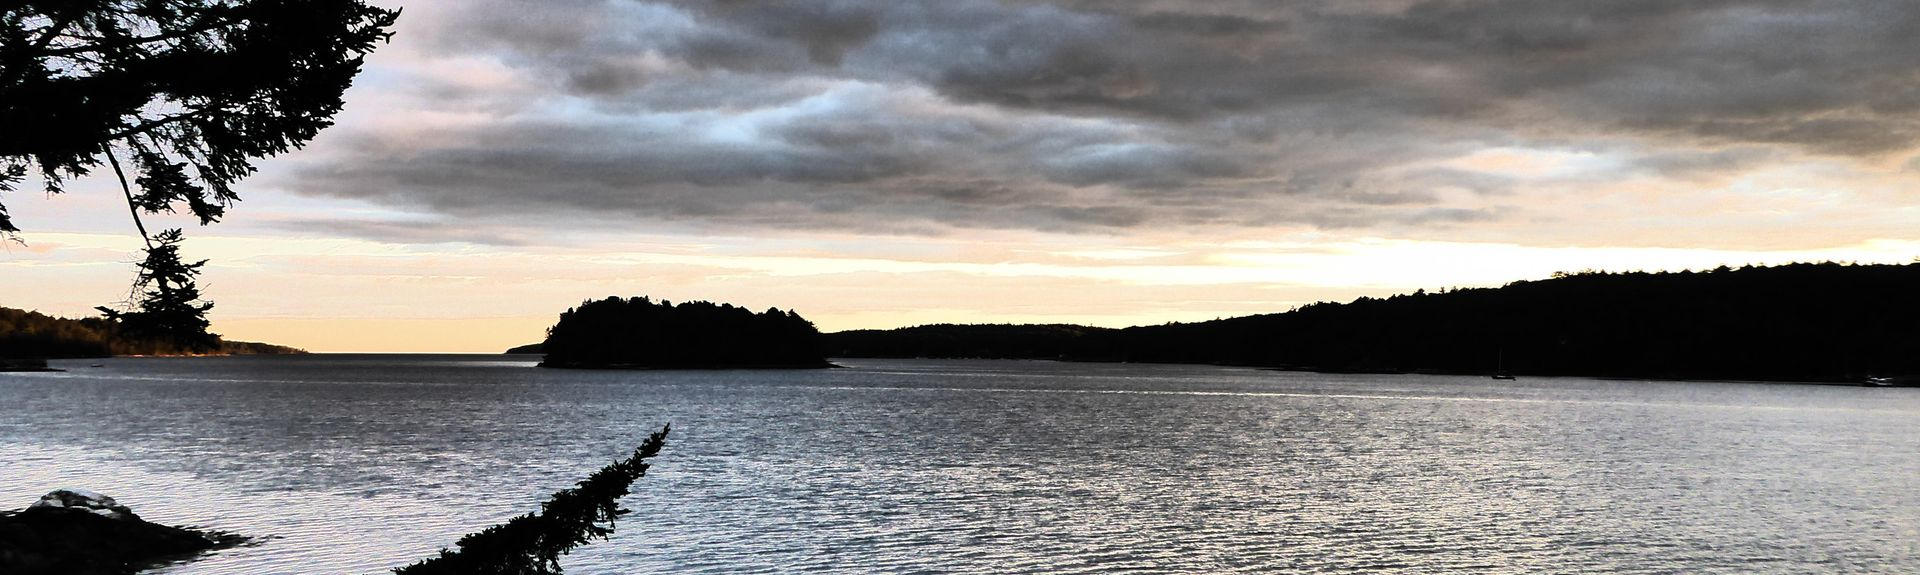 Damariscotta Lake, Jefferson, Maine, Estados Unidos